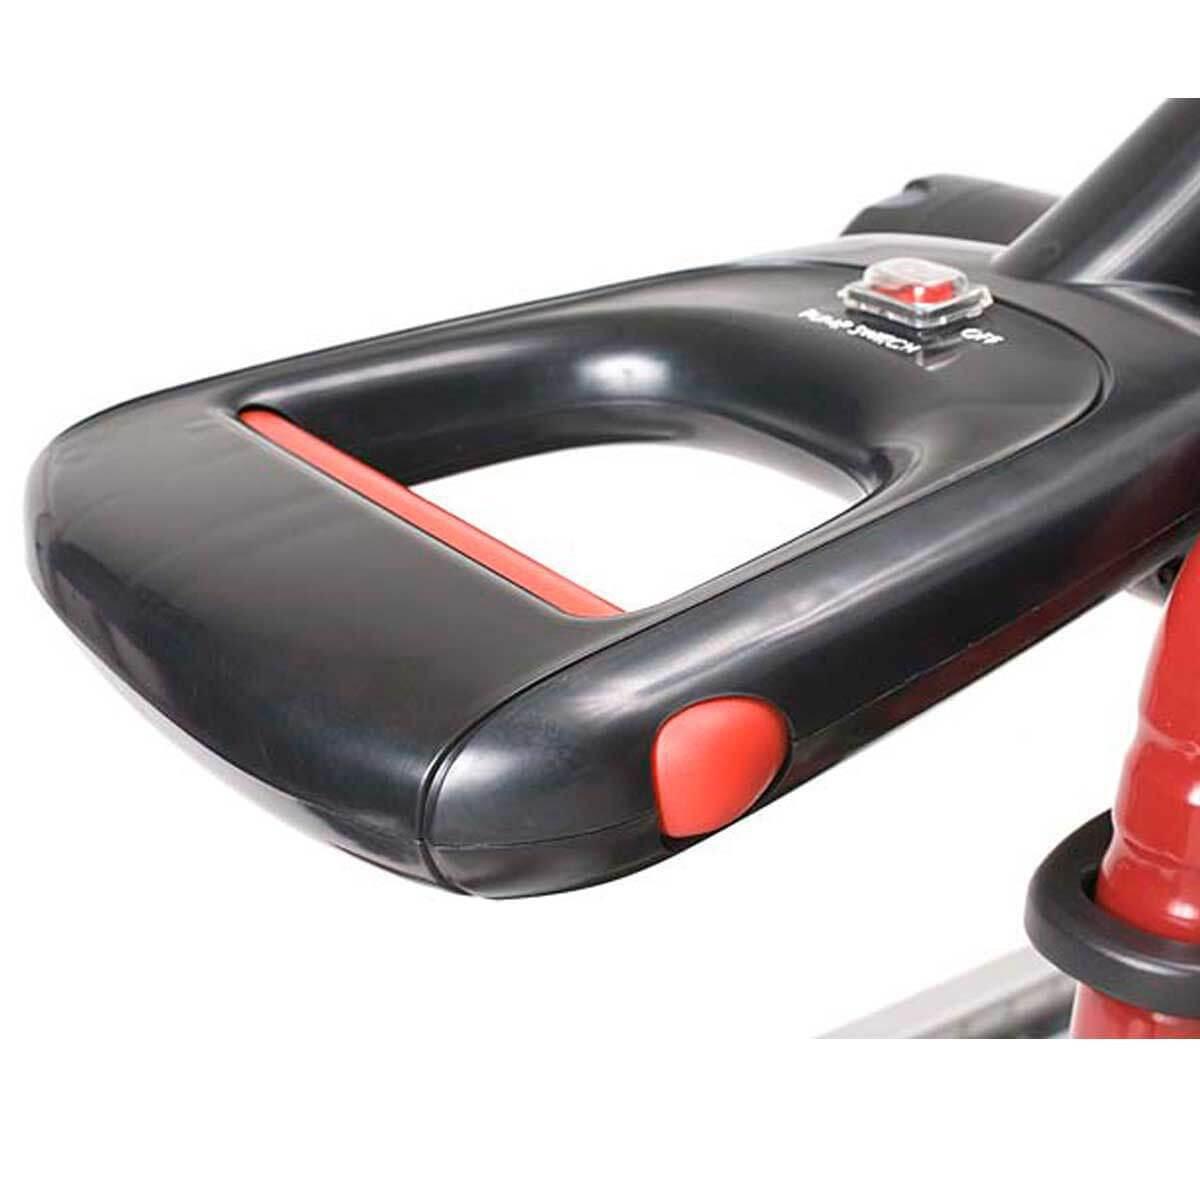 mk bx-4 14in pull handle